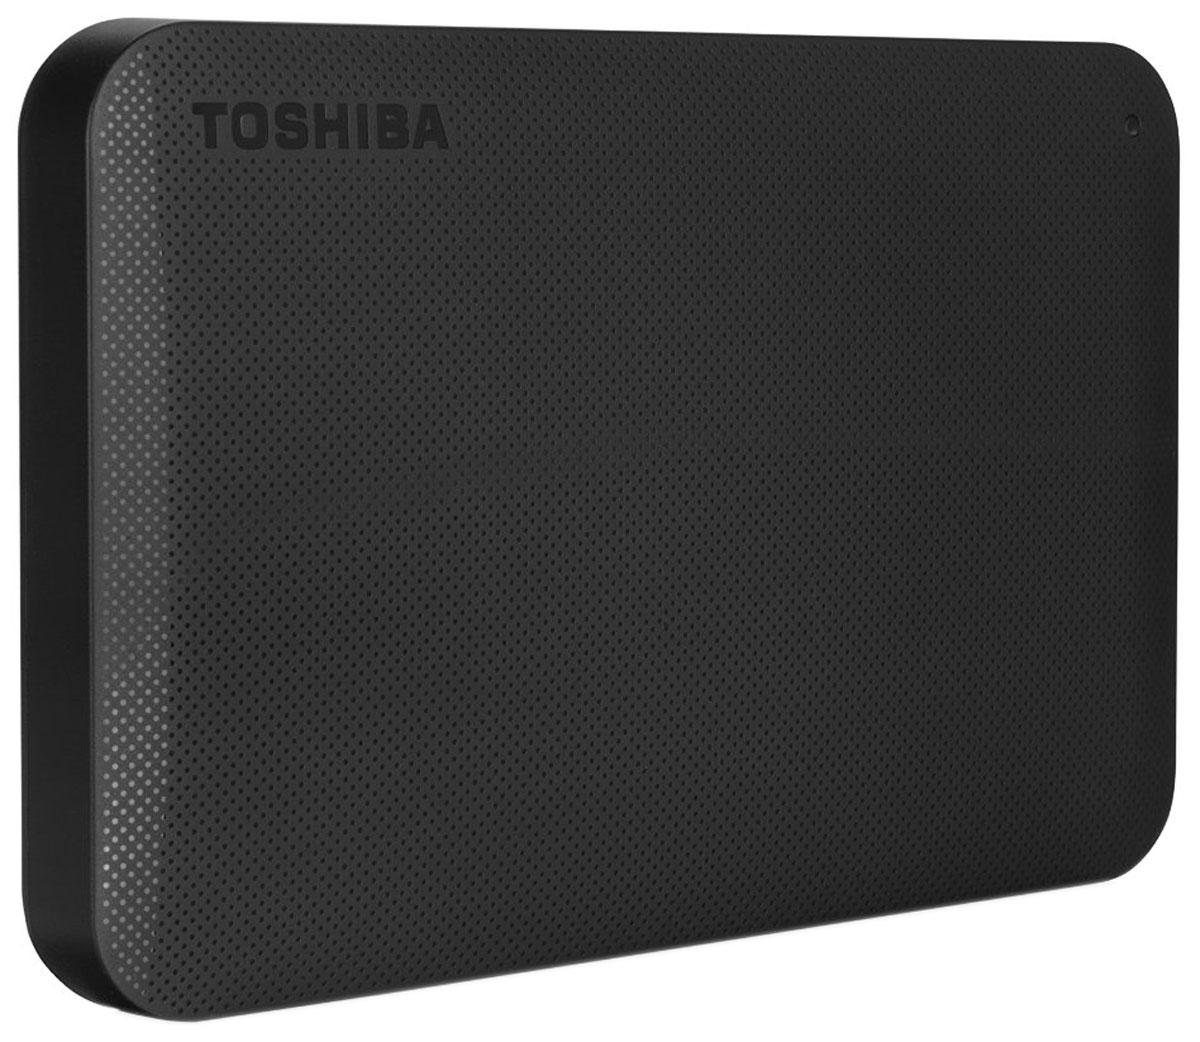 Внешний жесткий диск Toshiba Canvio Ready 3TB, HDTP230EK3CA, black все цены